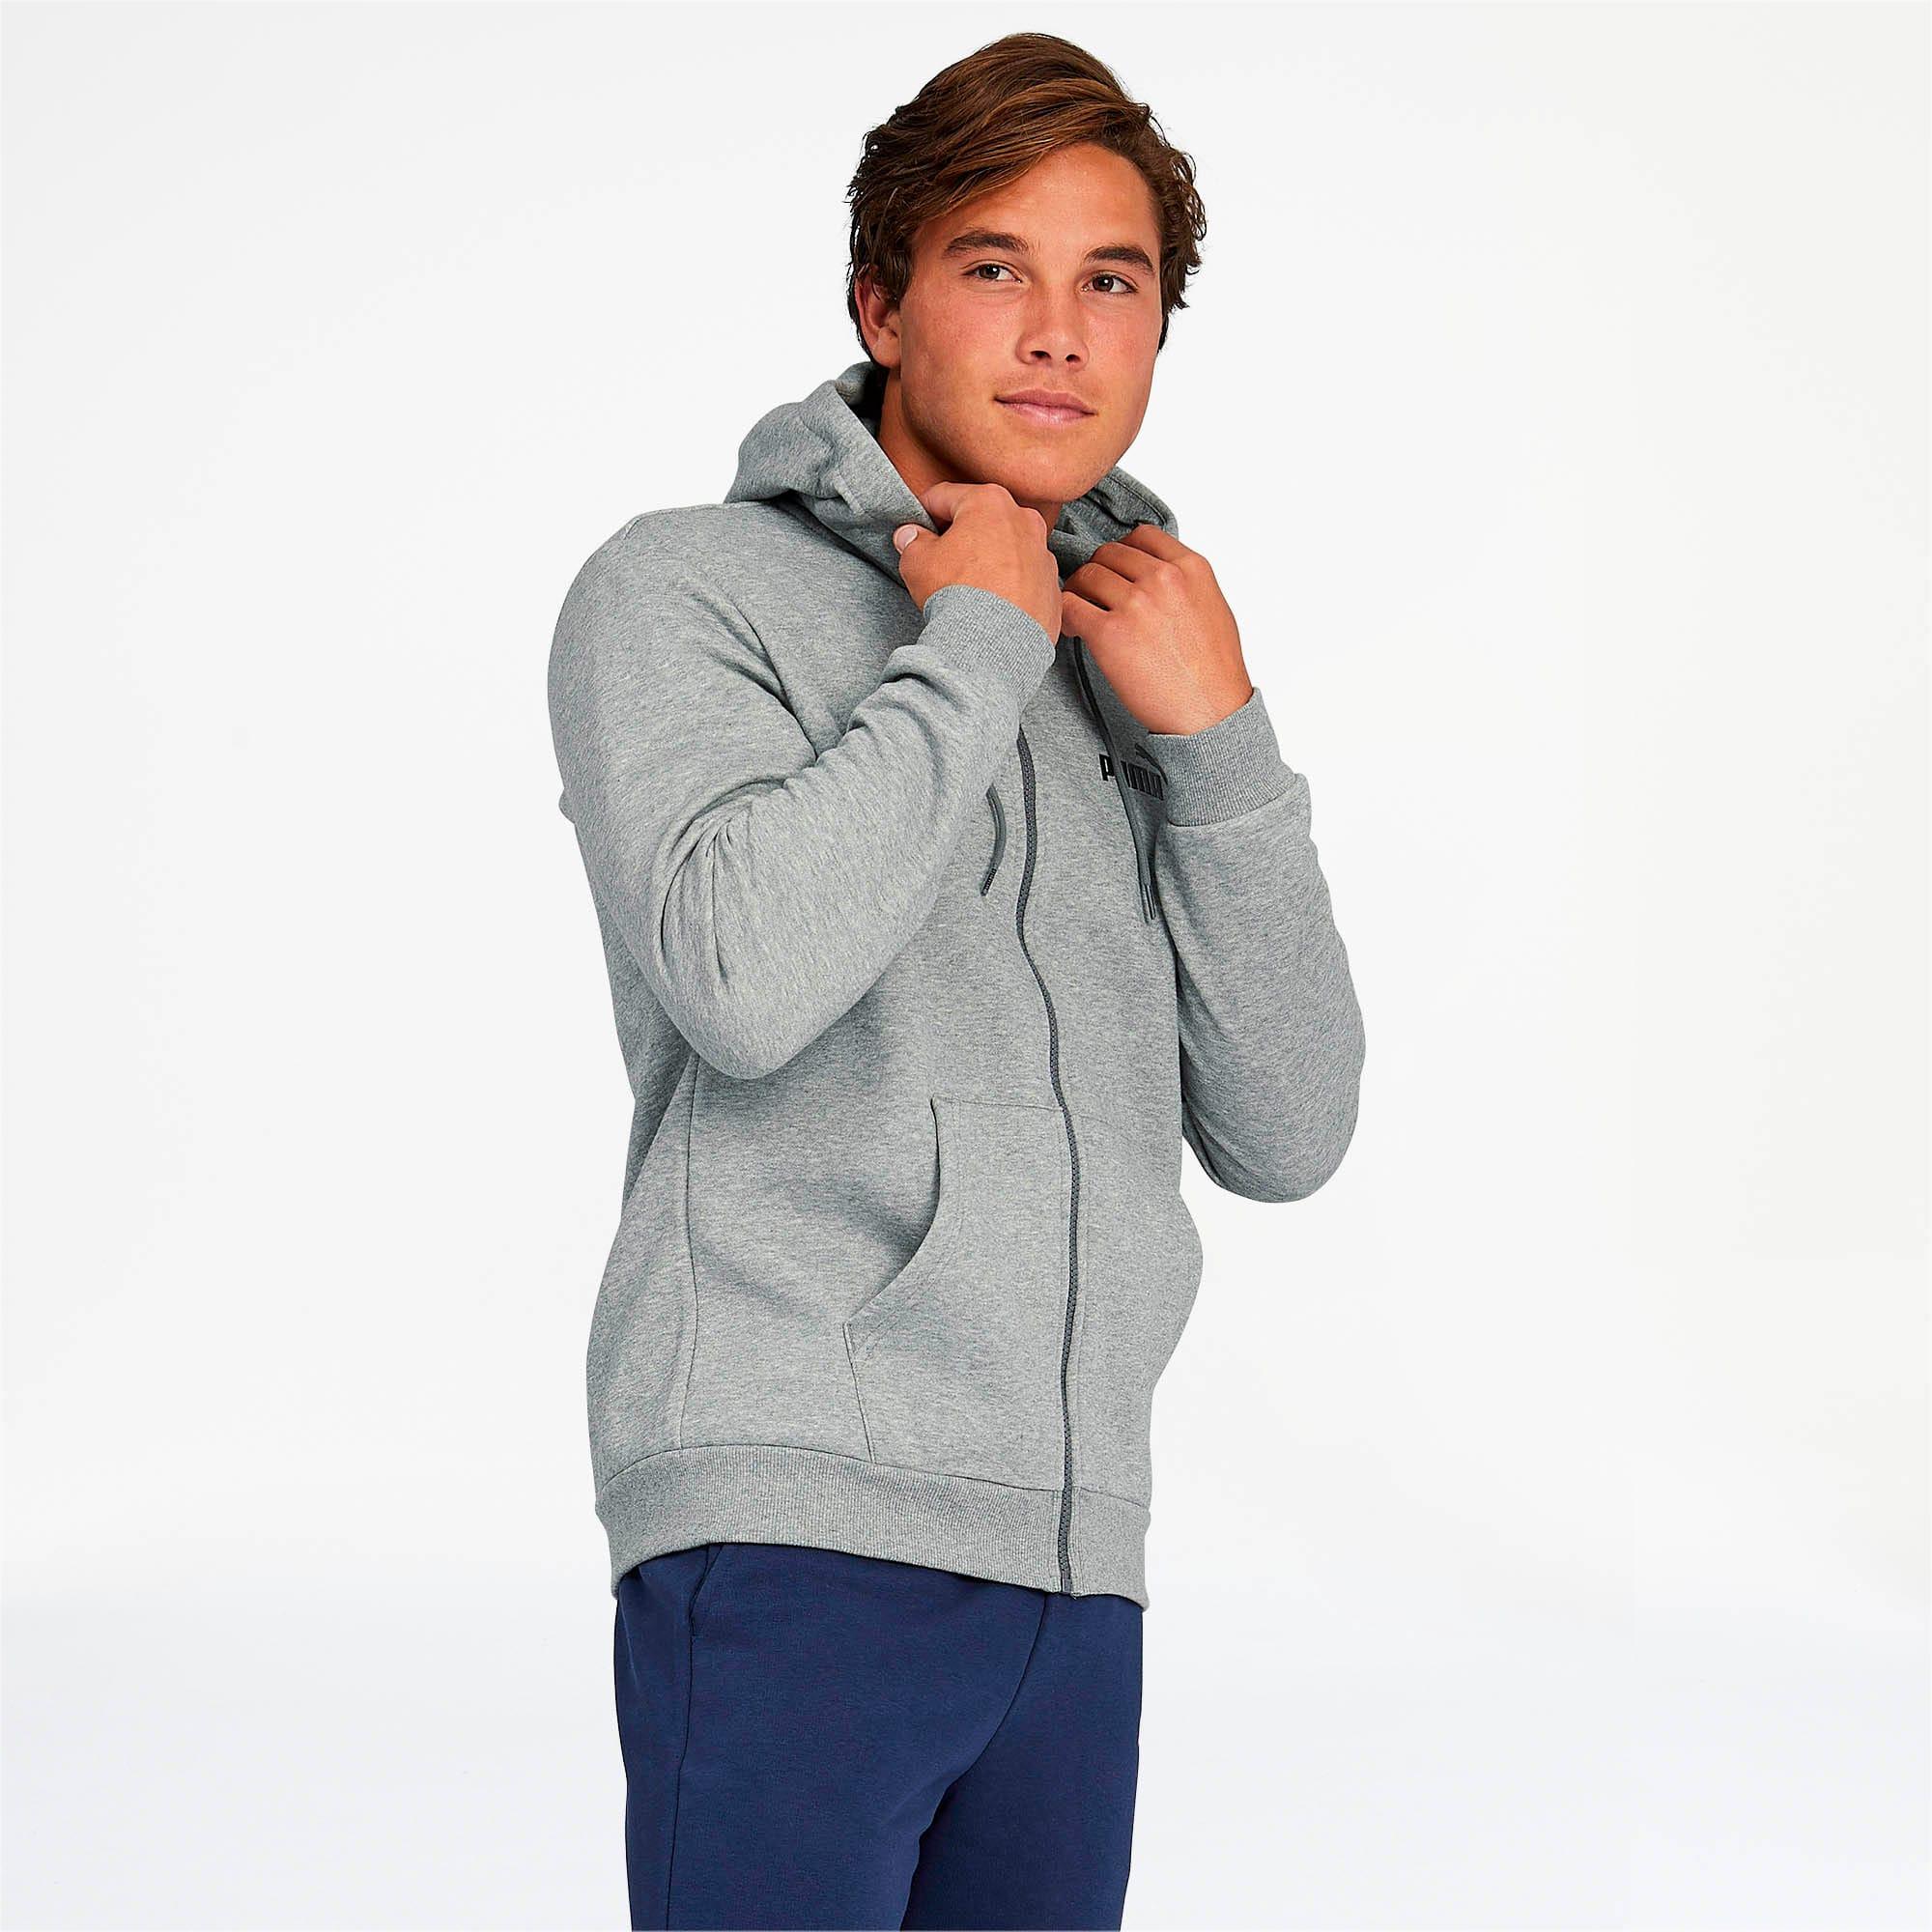 Thumbnail 1 of Essentials Men's Hooded Fleece Jacket, Medium Gray Heather, medium